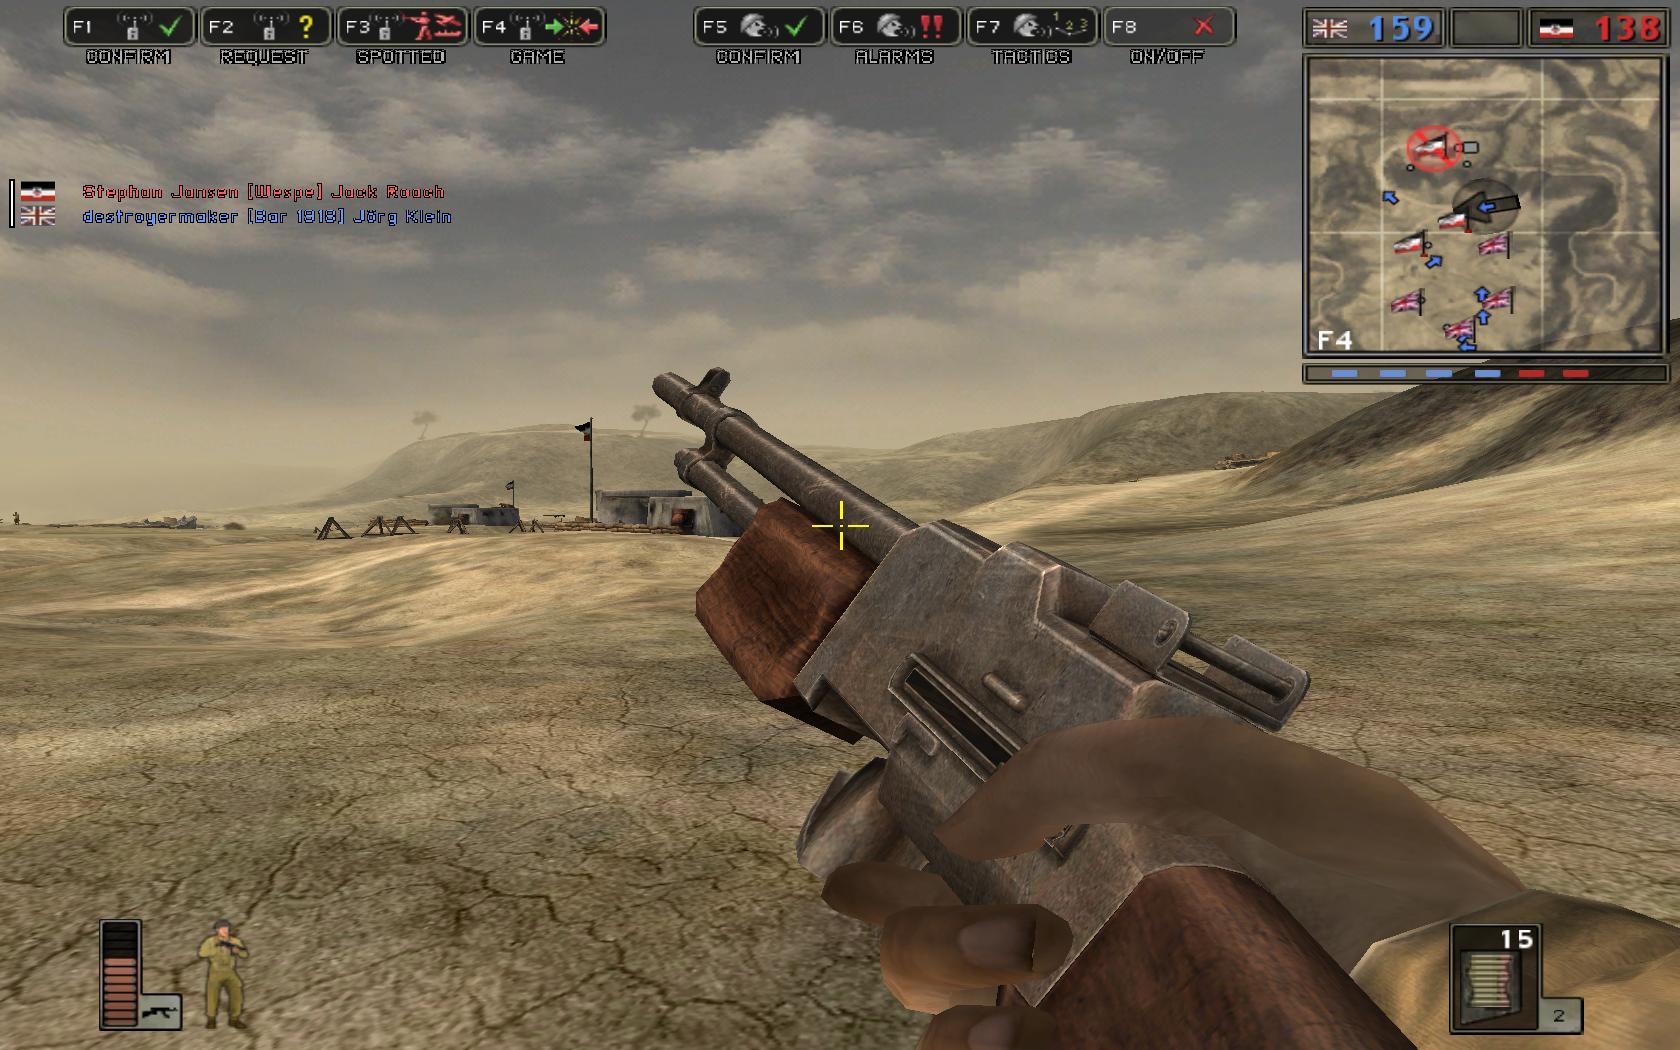 battlefield 1942 pouca memória ram